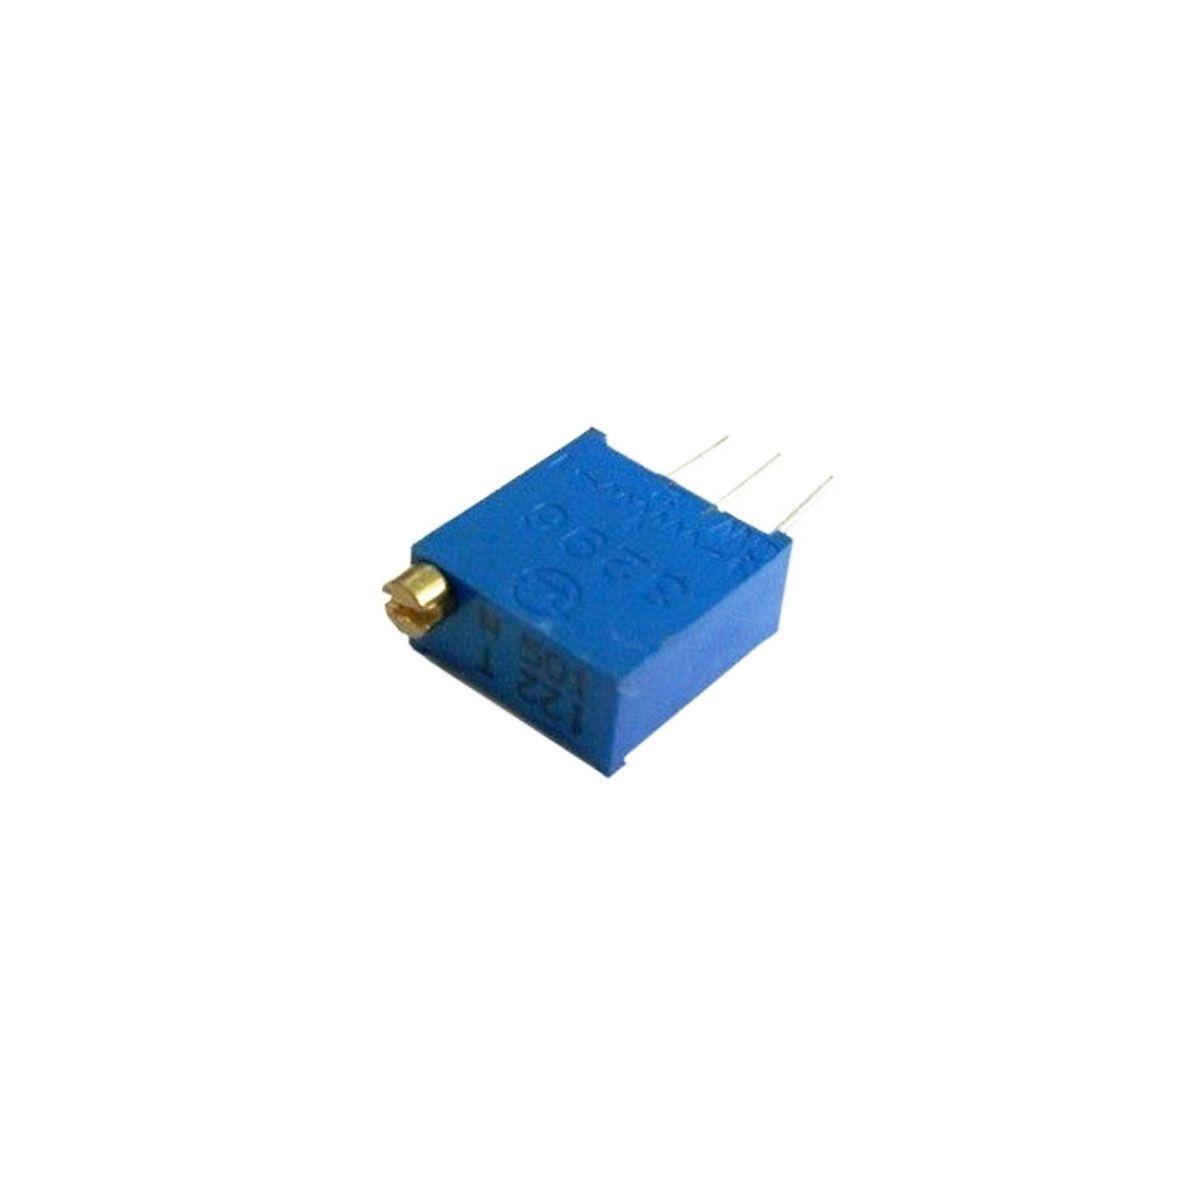 5x Trimpot / Potenciômetro Multivoltas 10K - Horizontal